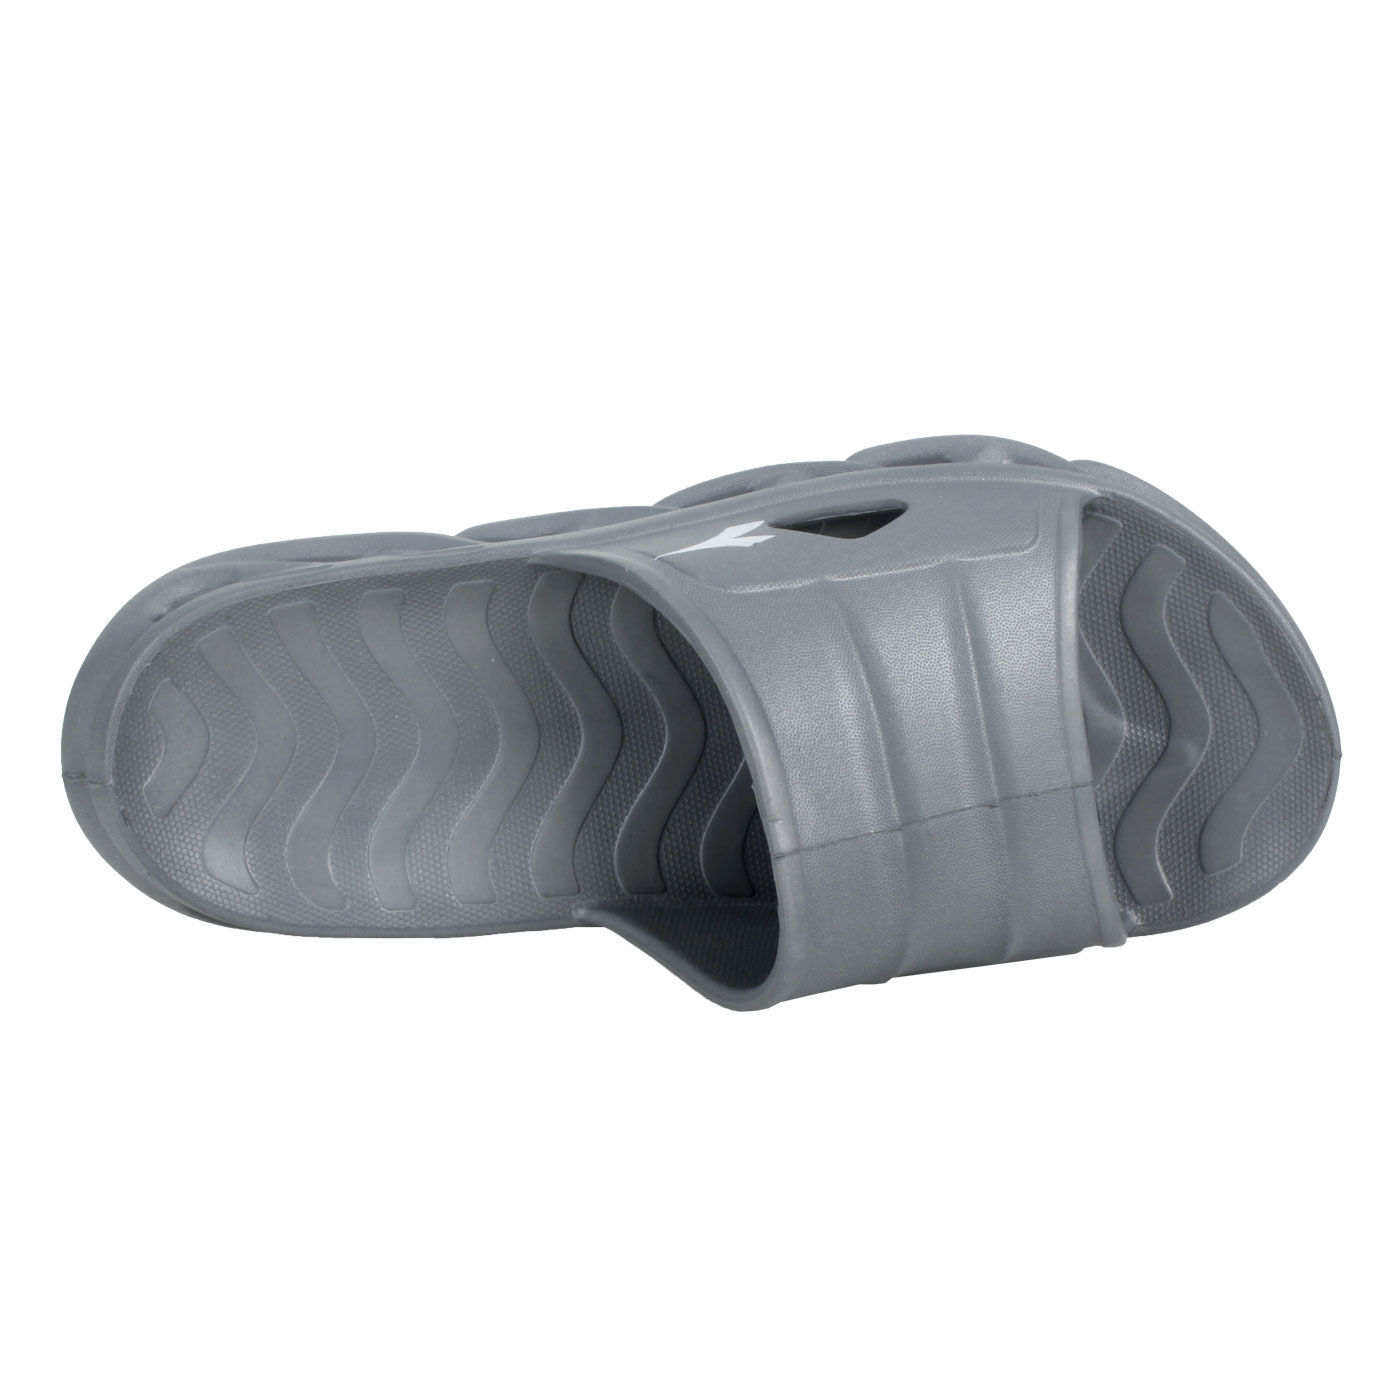 DIADORA 男款拖鞋(袋裝) DA71218 - 灰